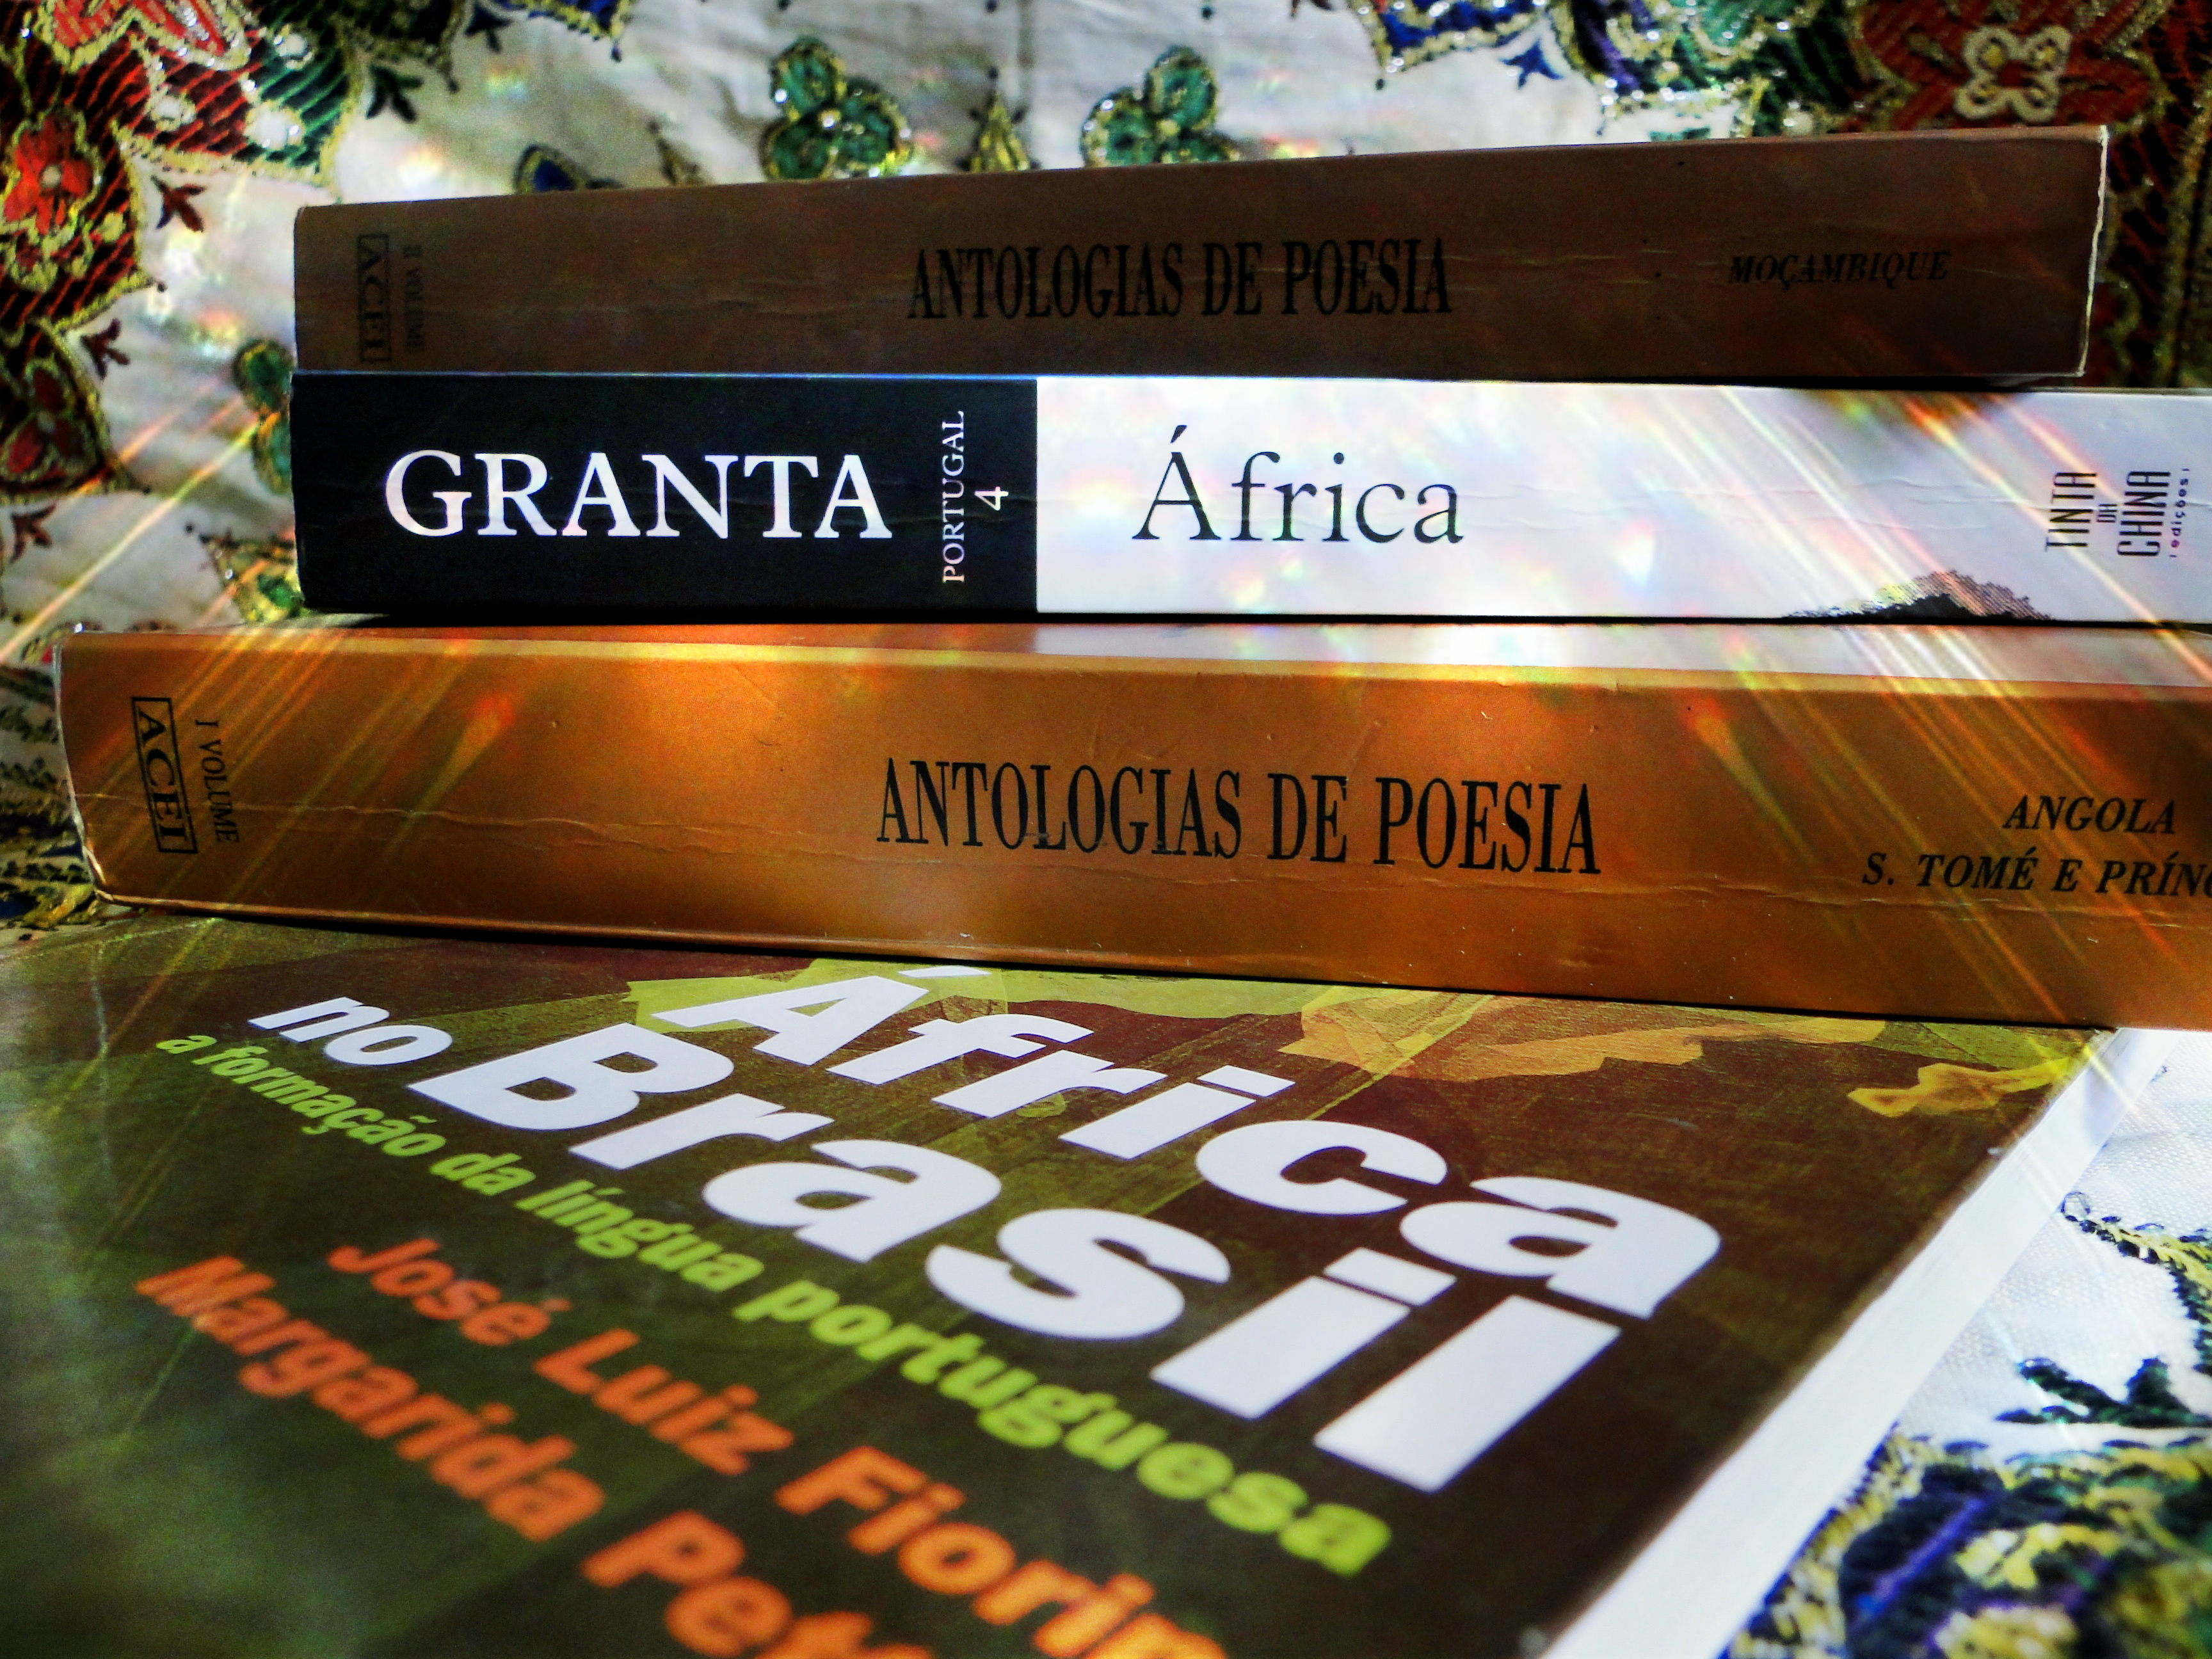 VI Fórum de Africanidades debate: Preconceito, Racismo e Intolerância